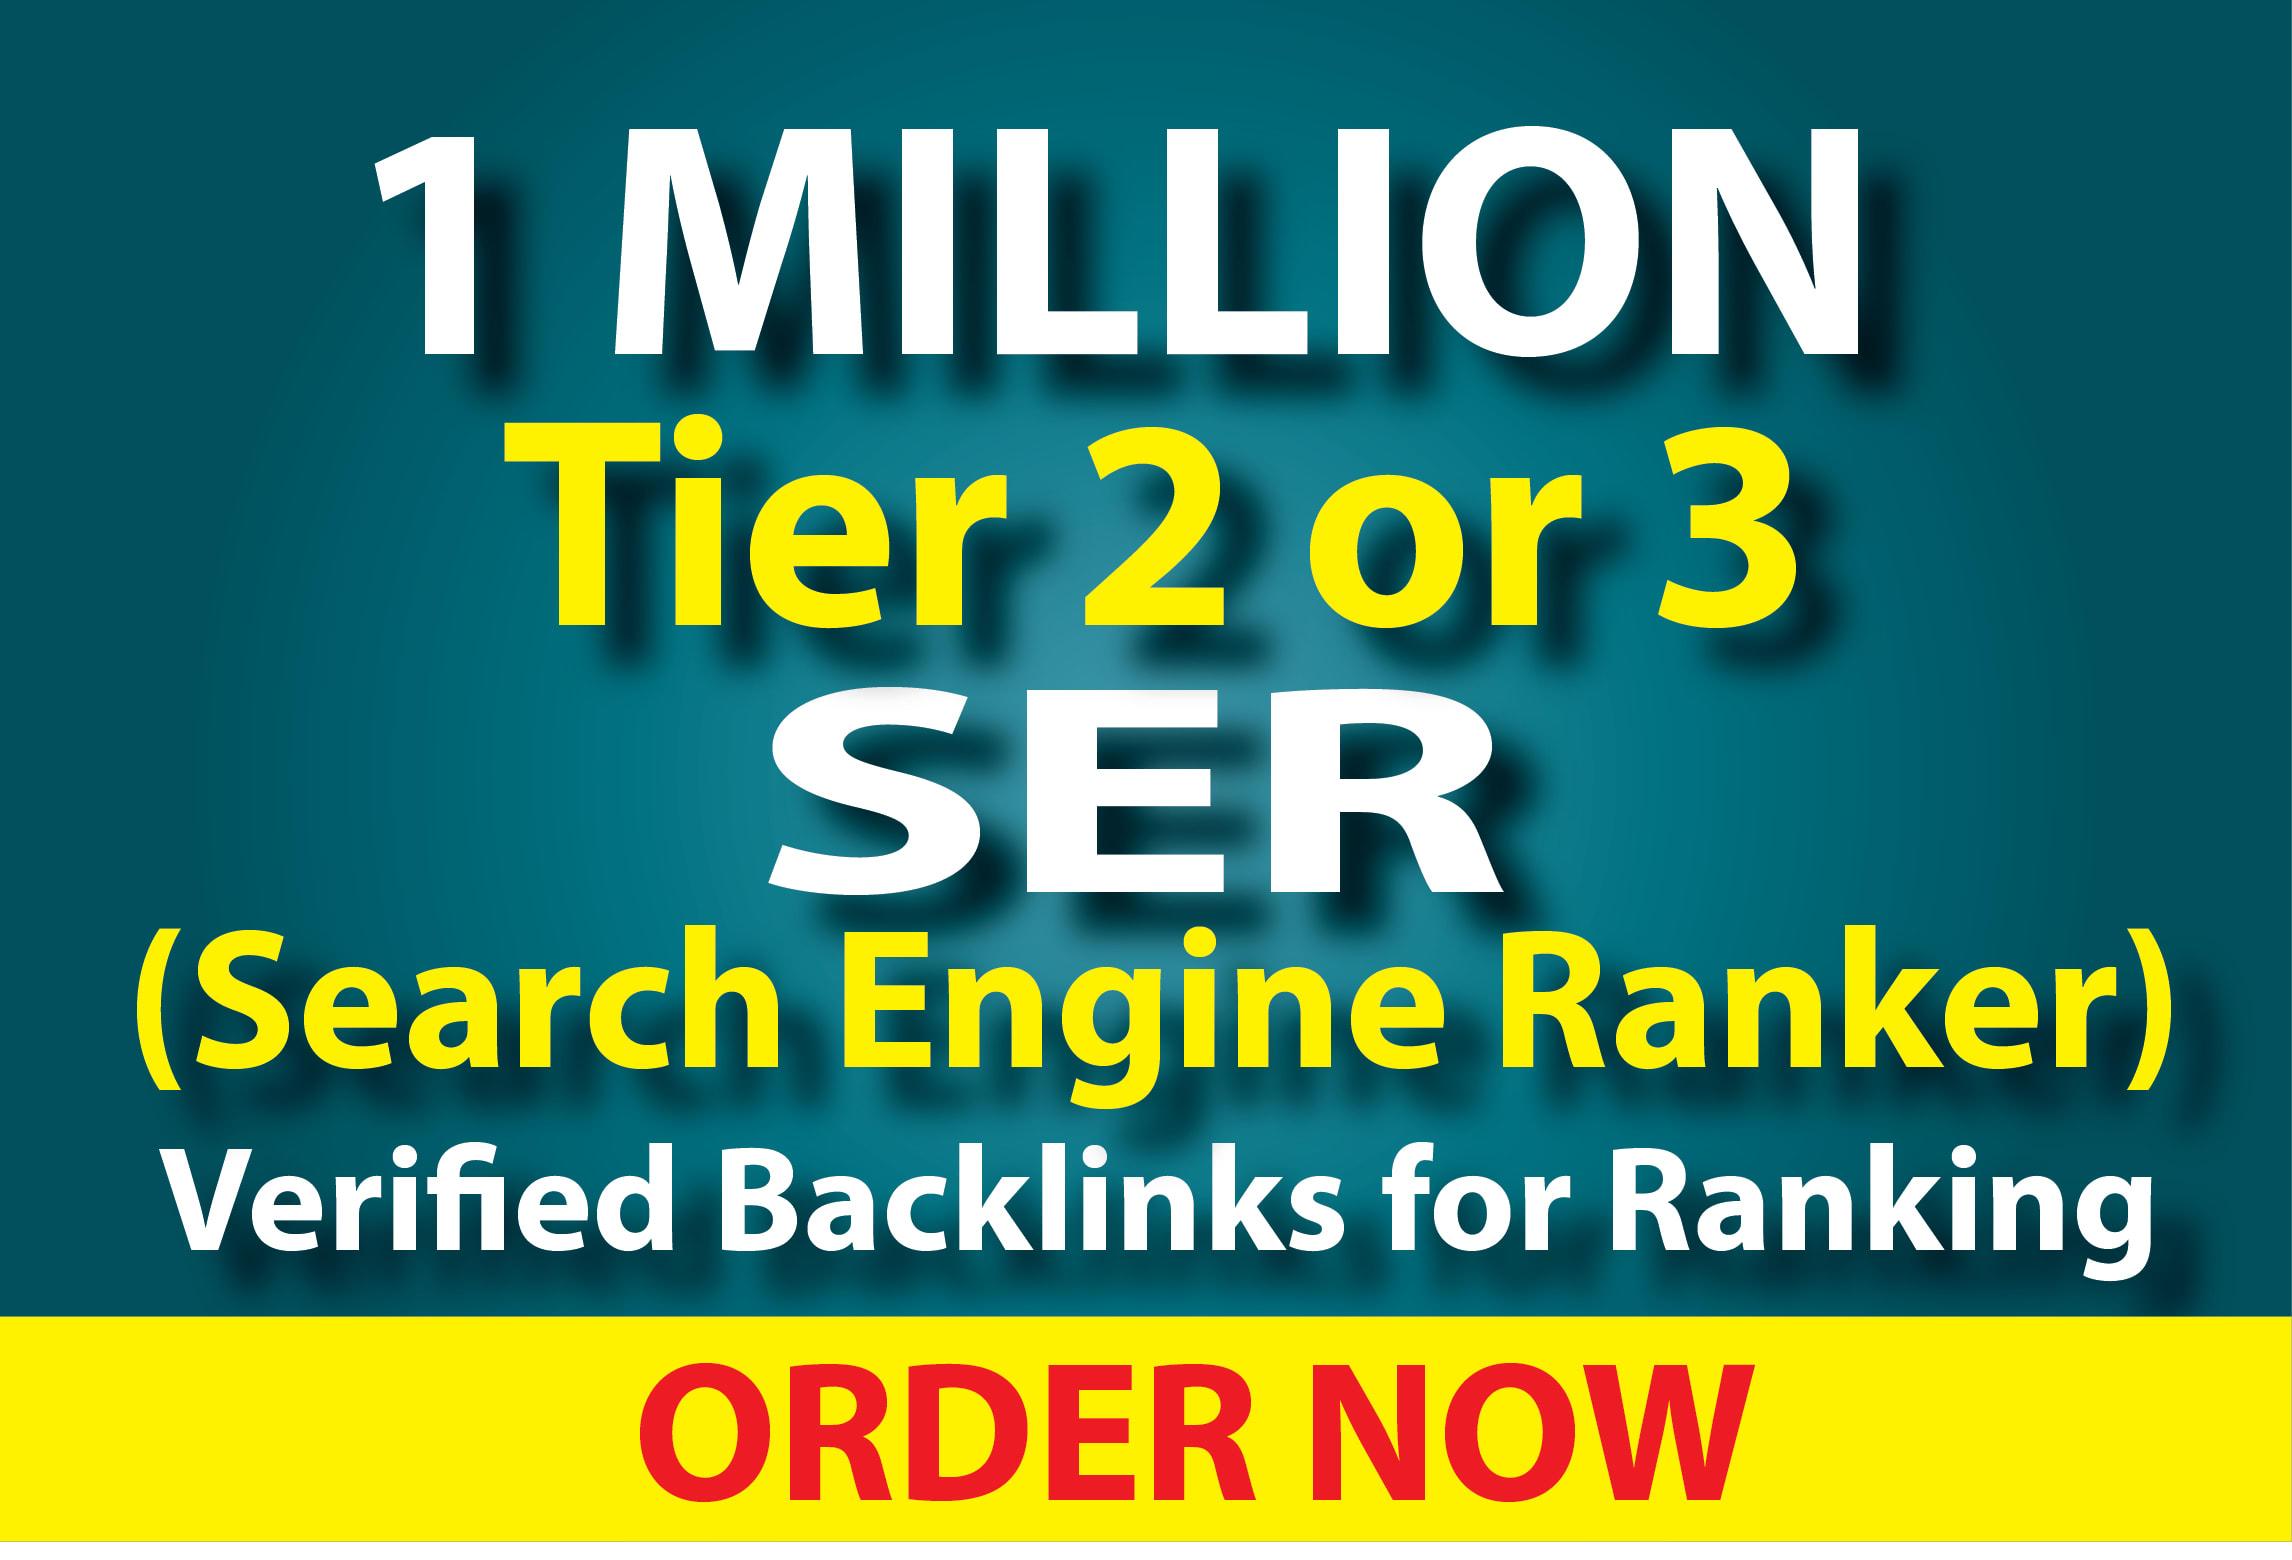 Do 1 million tier 2 or 3 Ser GSA verified backlinks for ranking